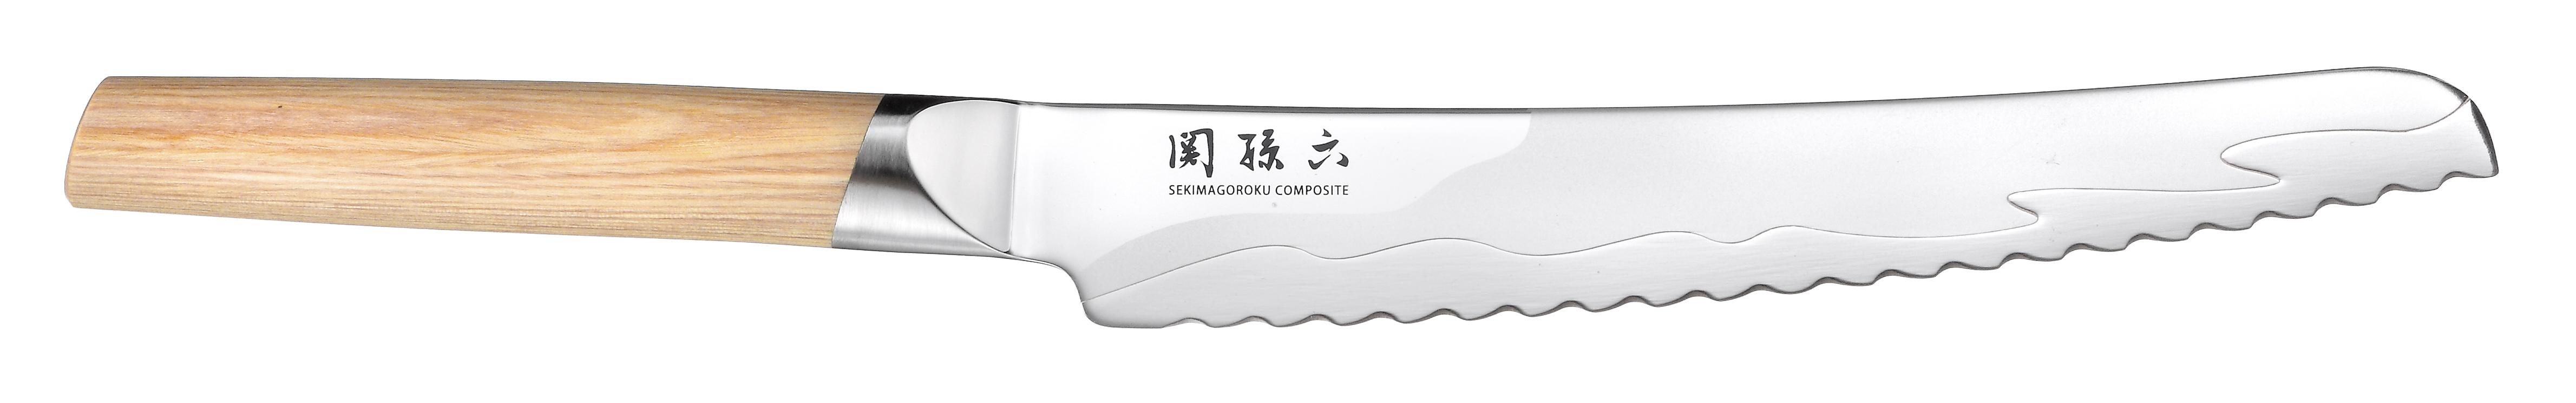 KAI SEKI MAGOROKU COMPOSITE MGC-0405